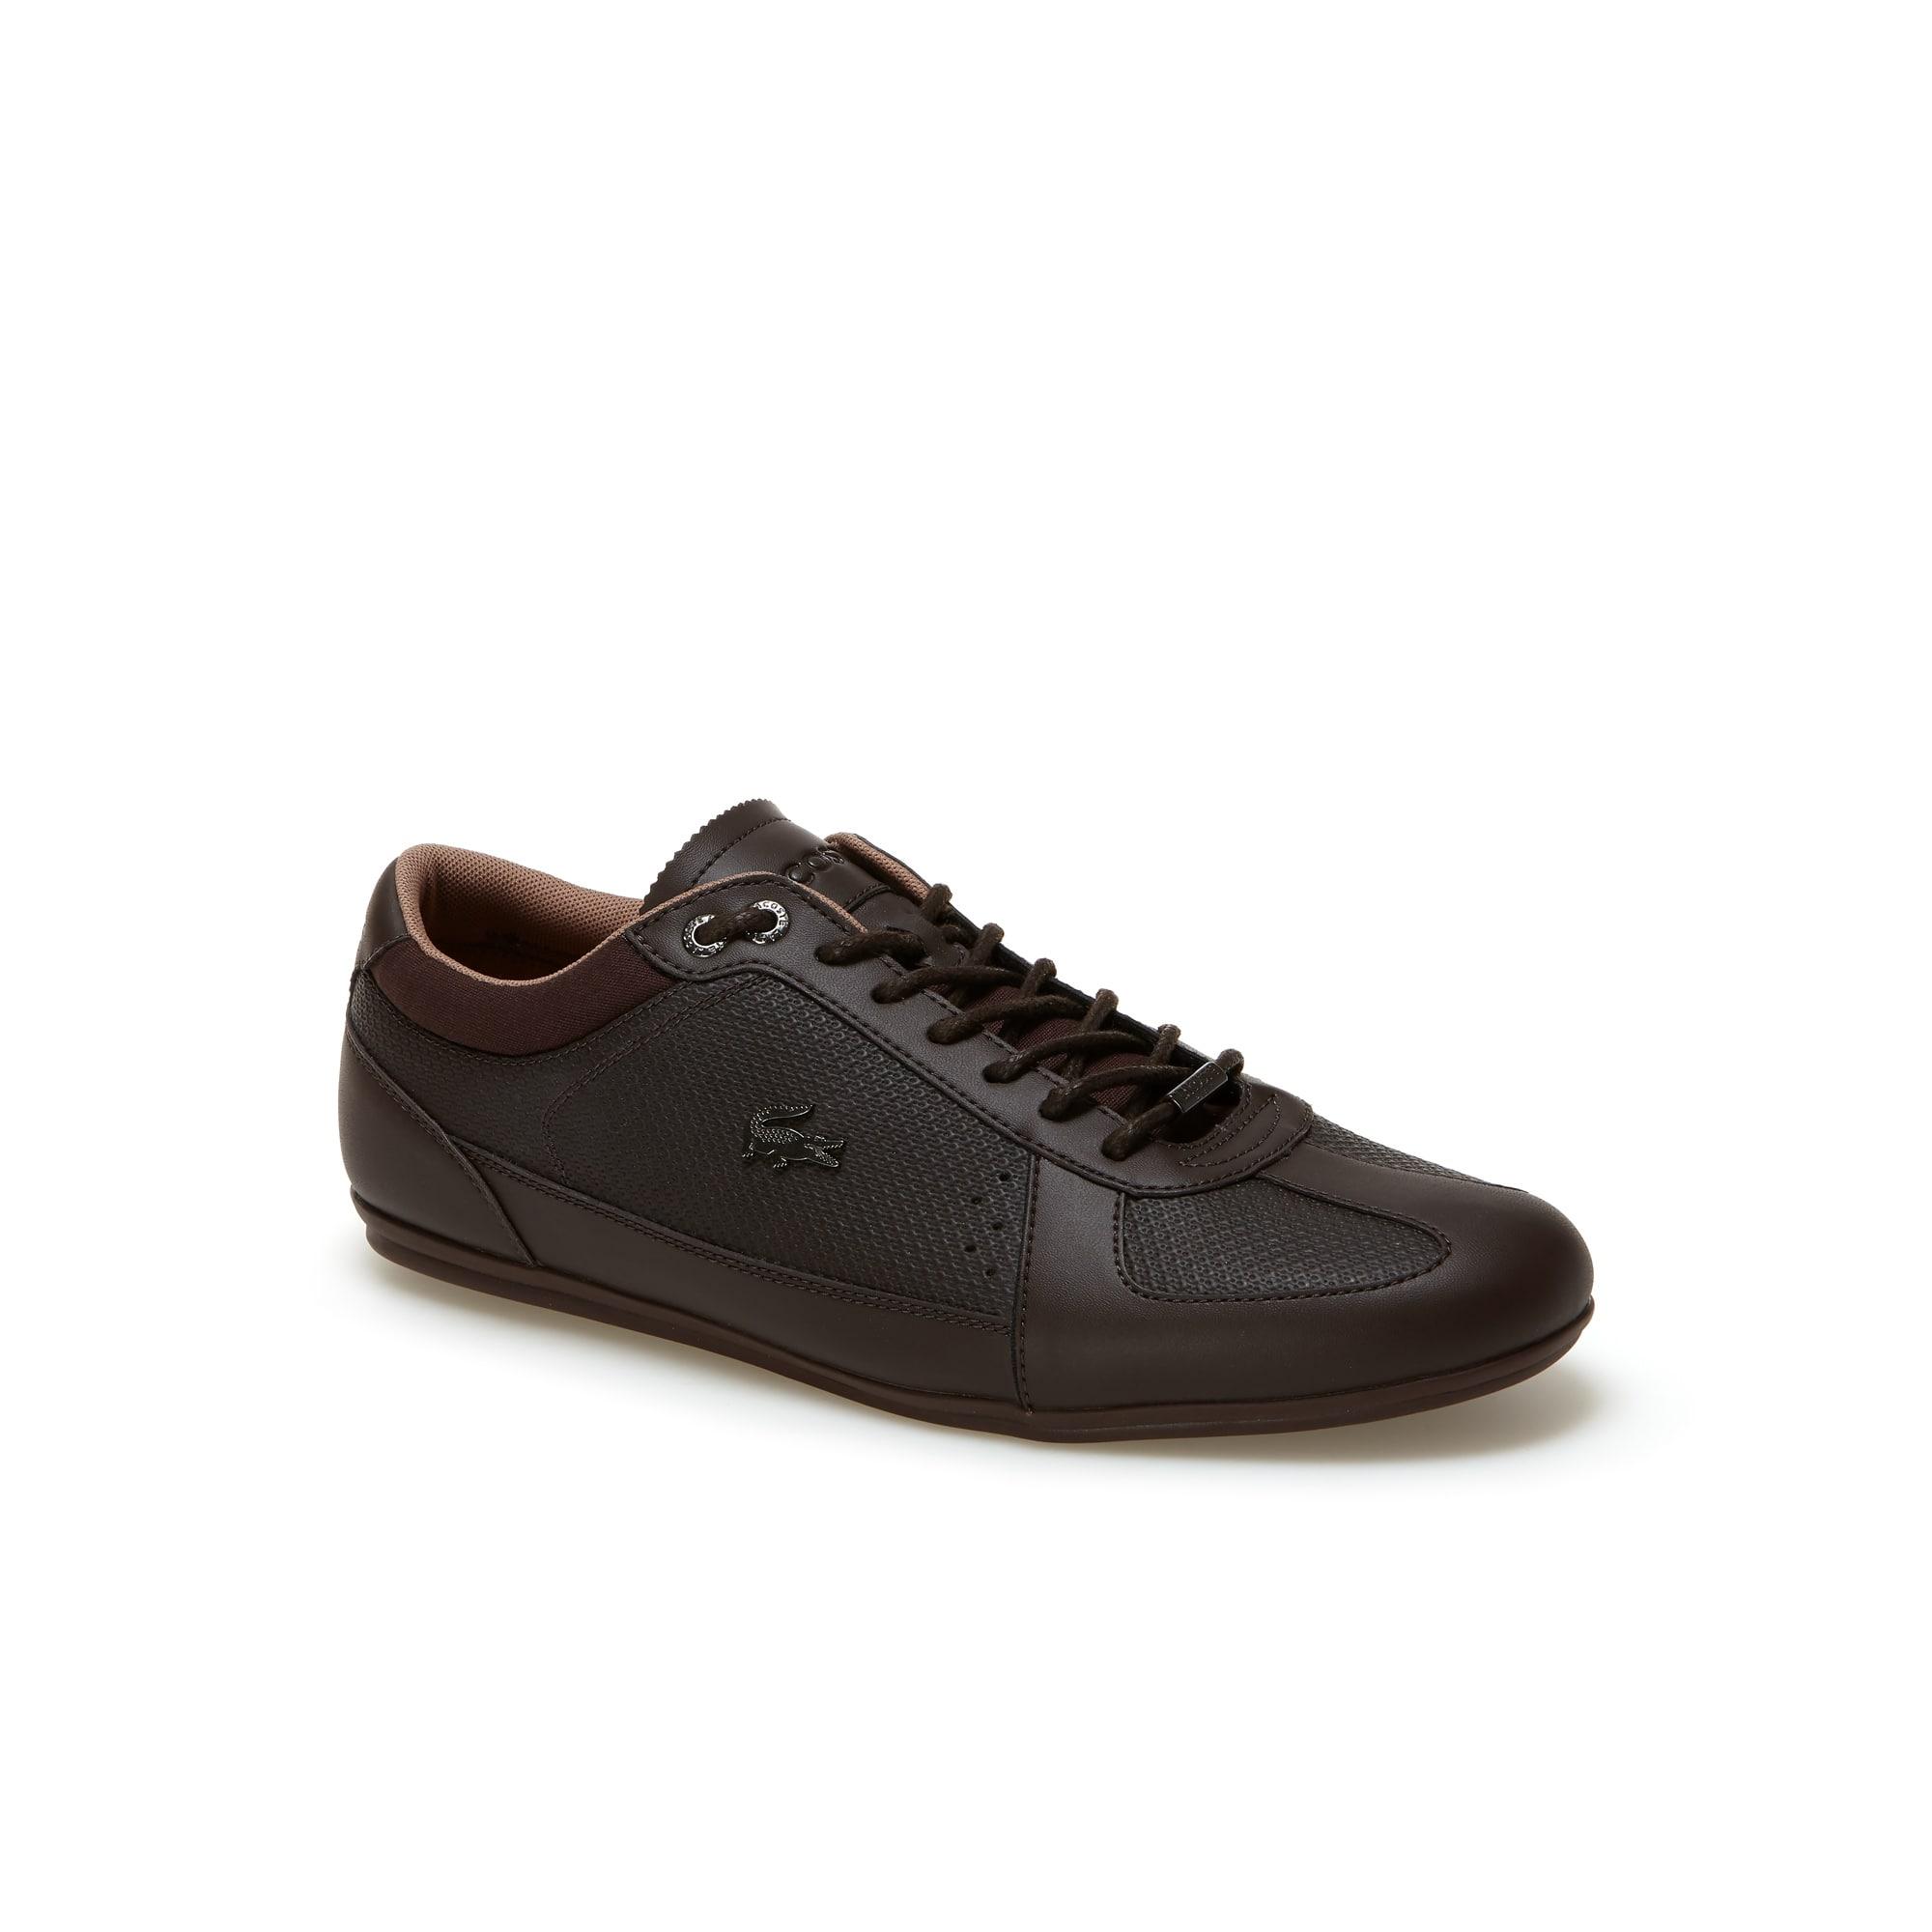 Men's Evara Leather Trainers